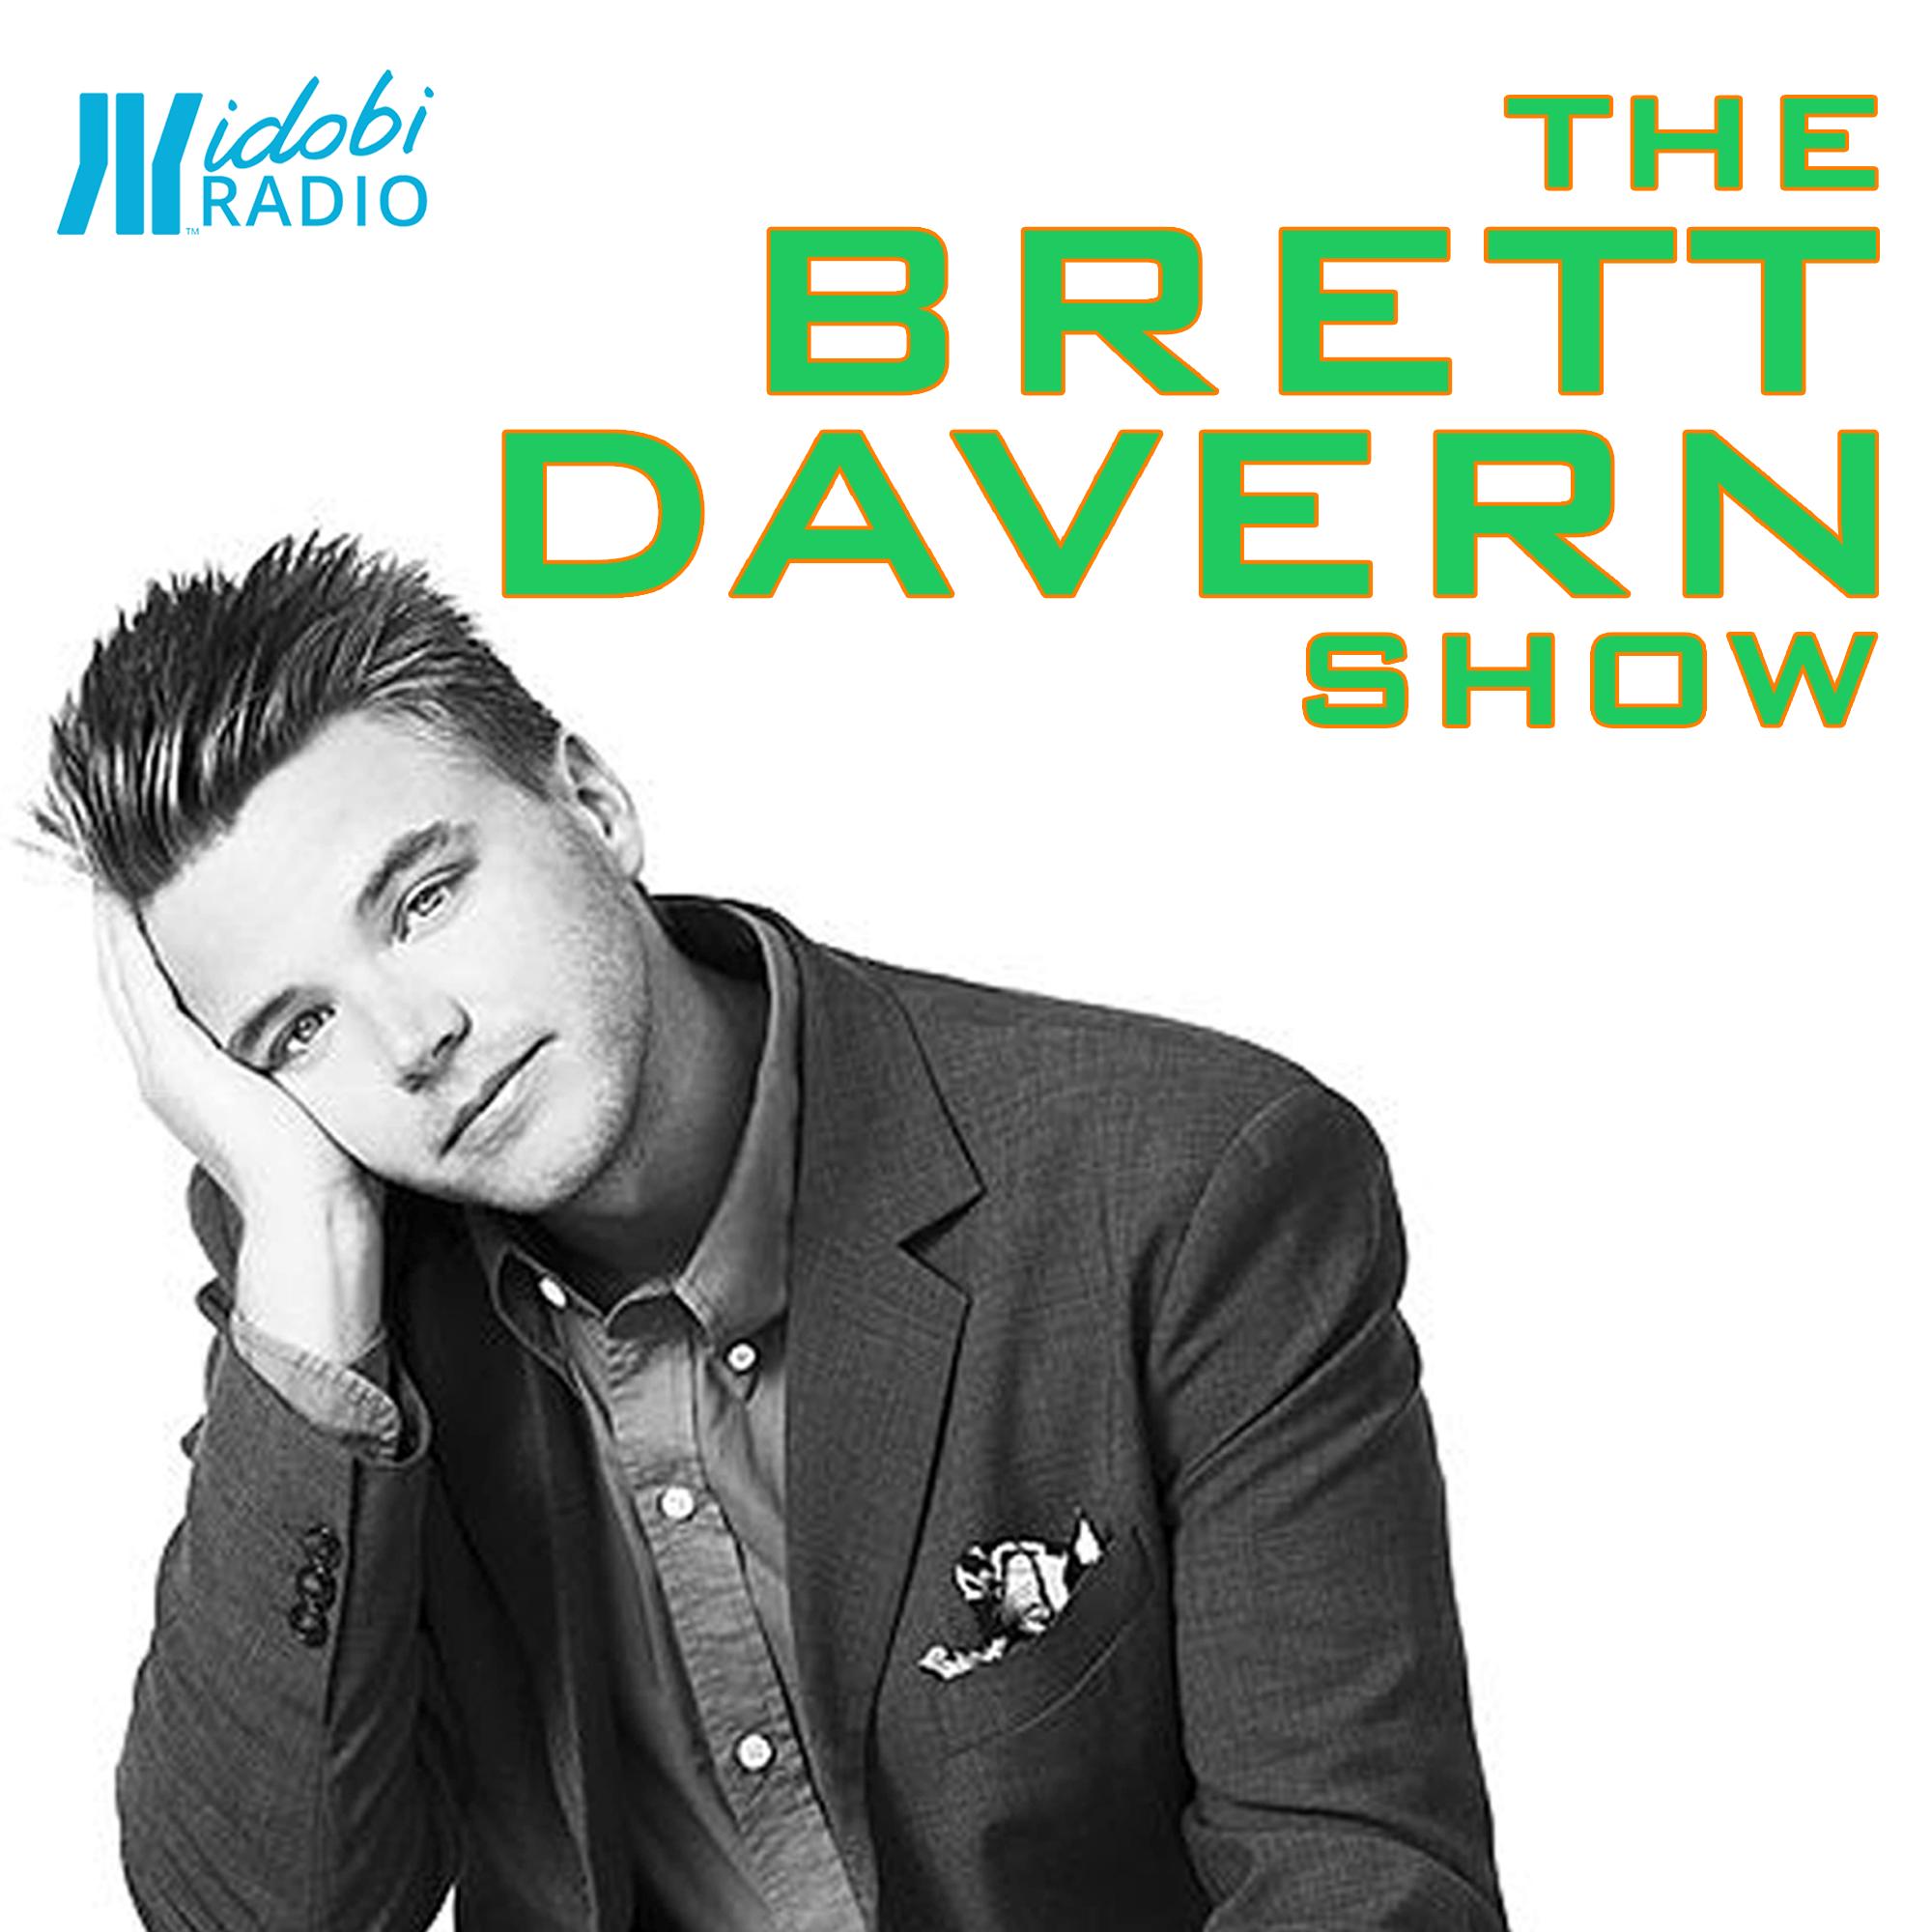 Brett-Davern-Show.png